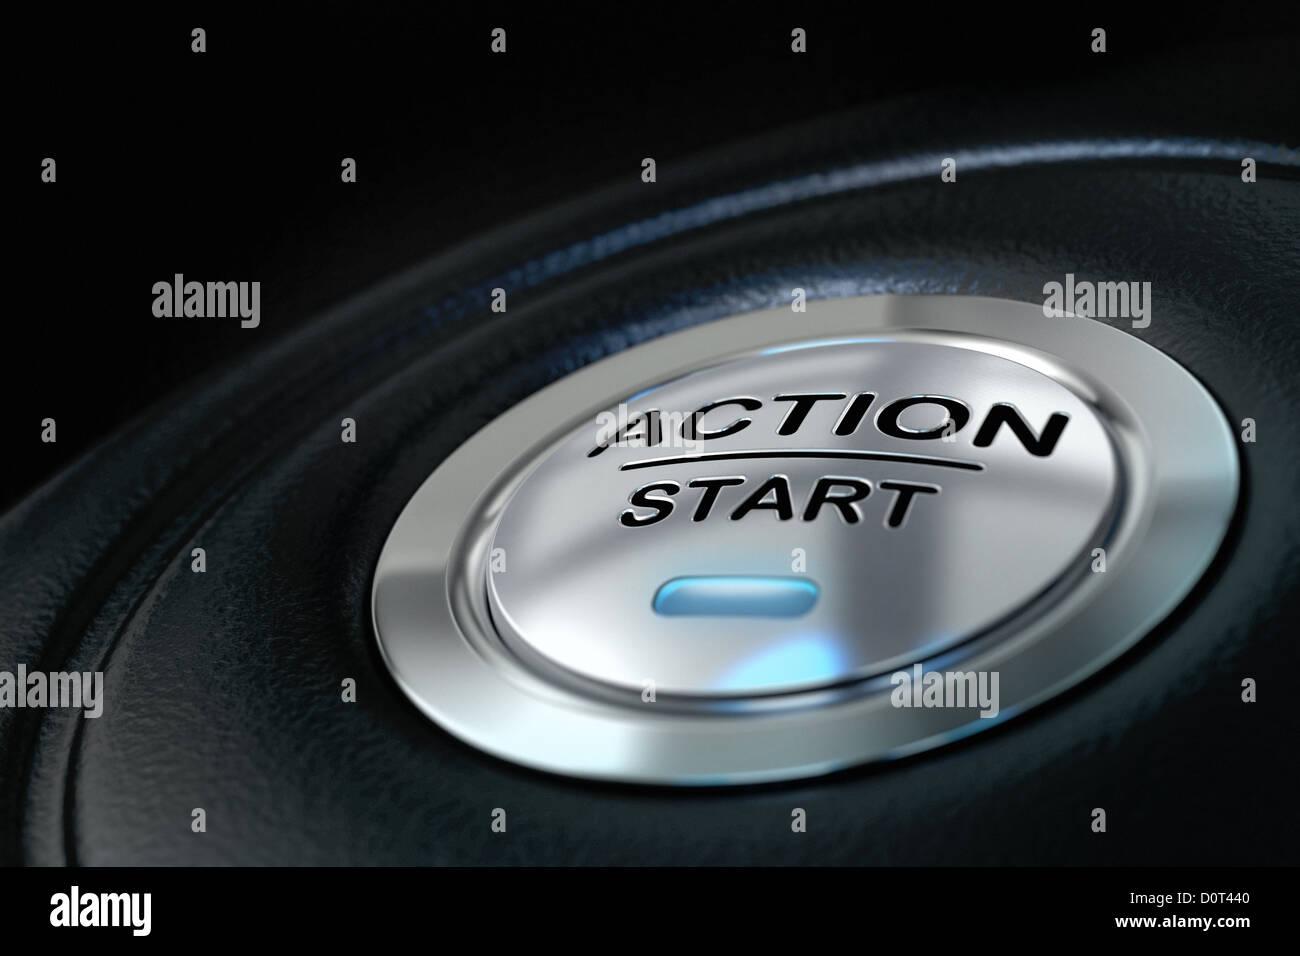 Presiona el botón de inicio de acción sobre fondo negro, azul claro, motivación concepto Imagen De Stock